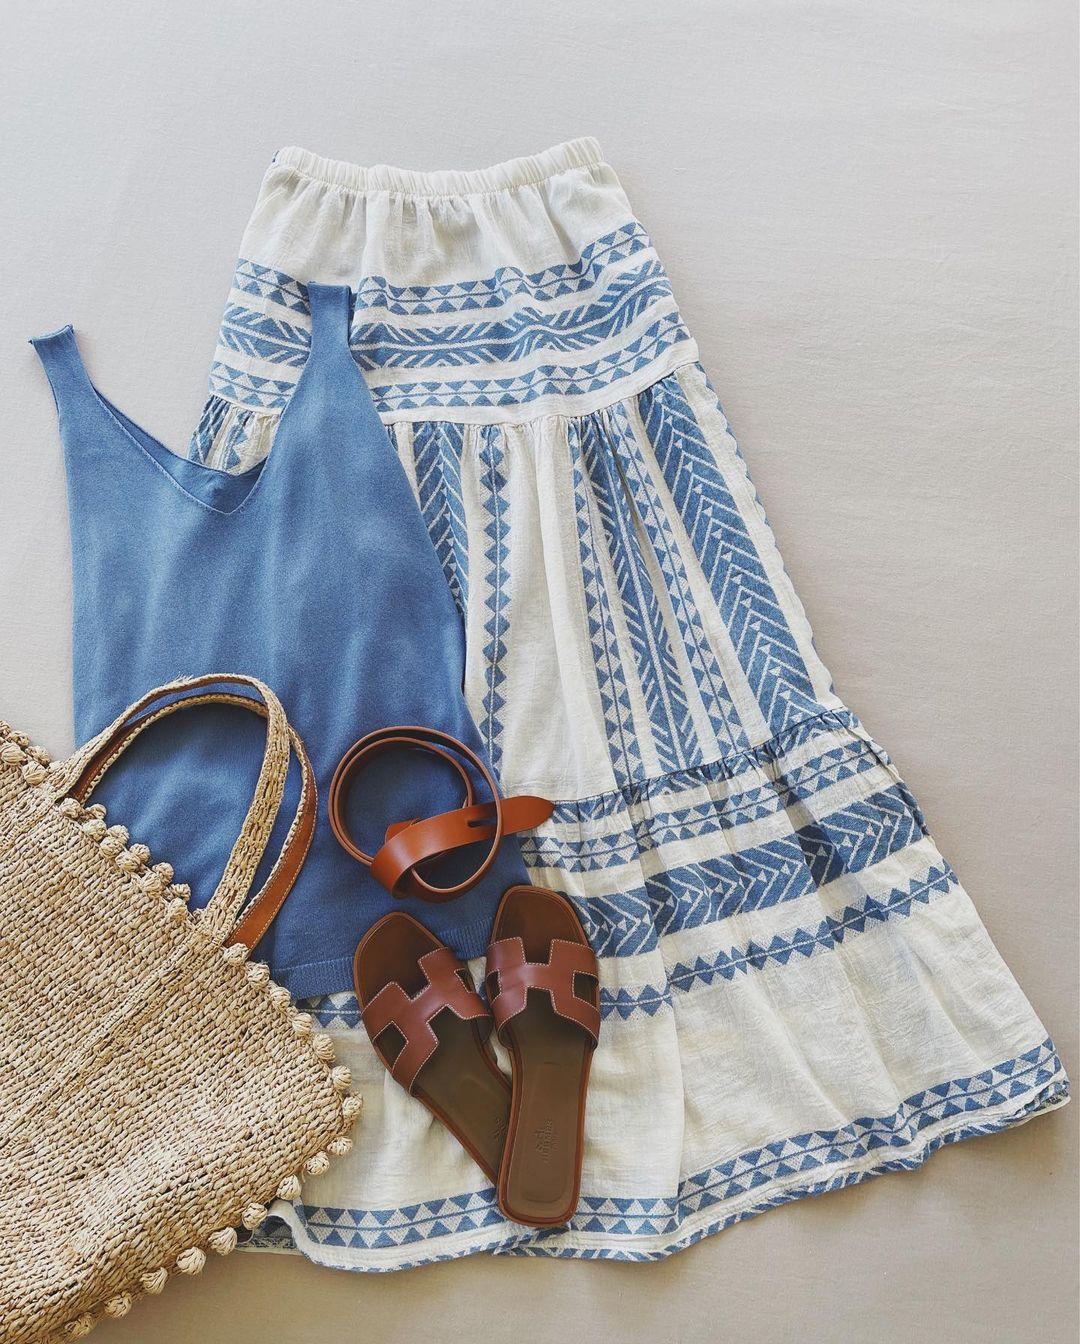 idee outfit estate moda curvy